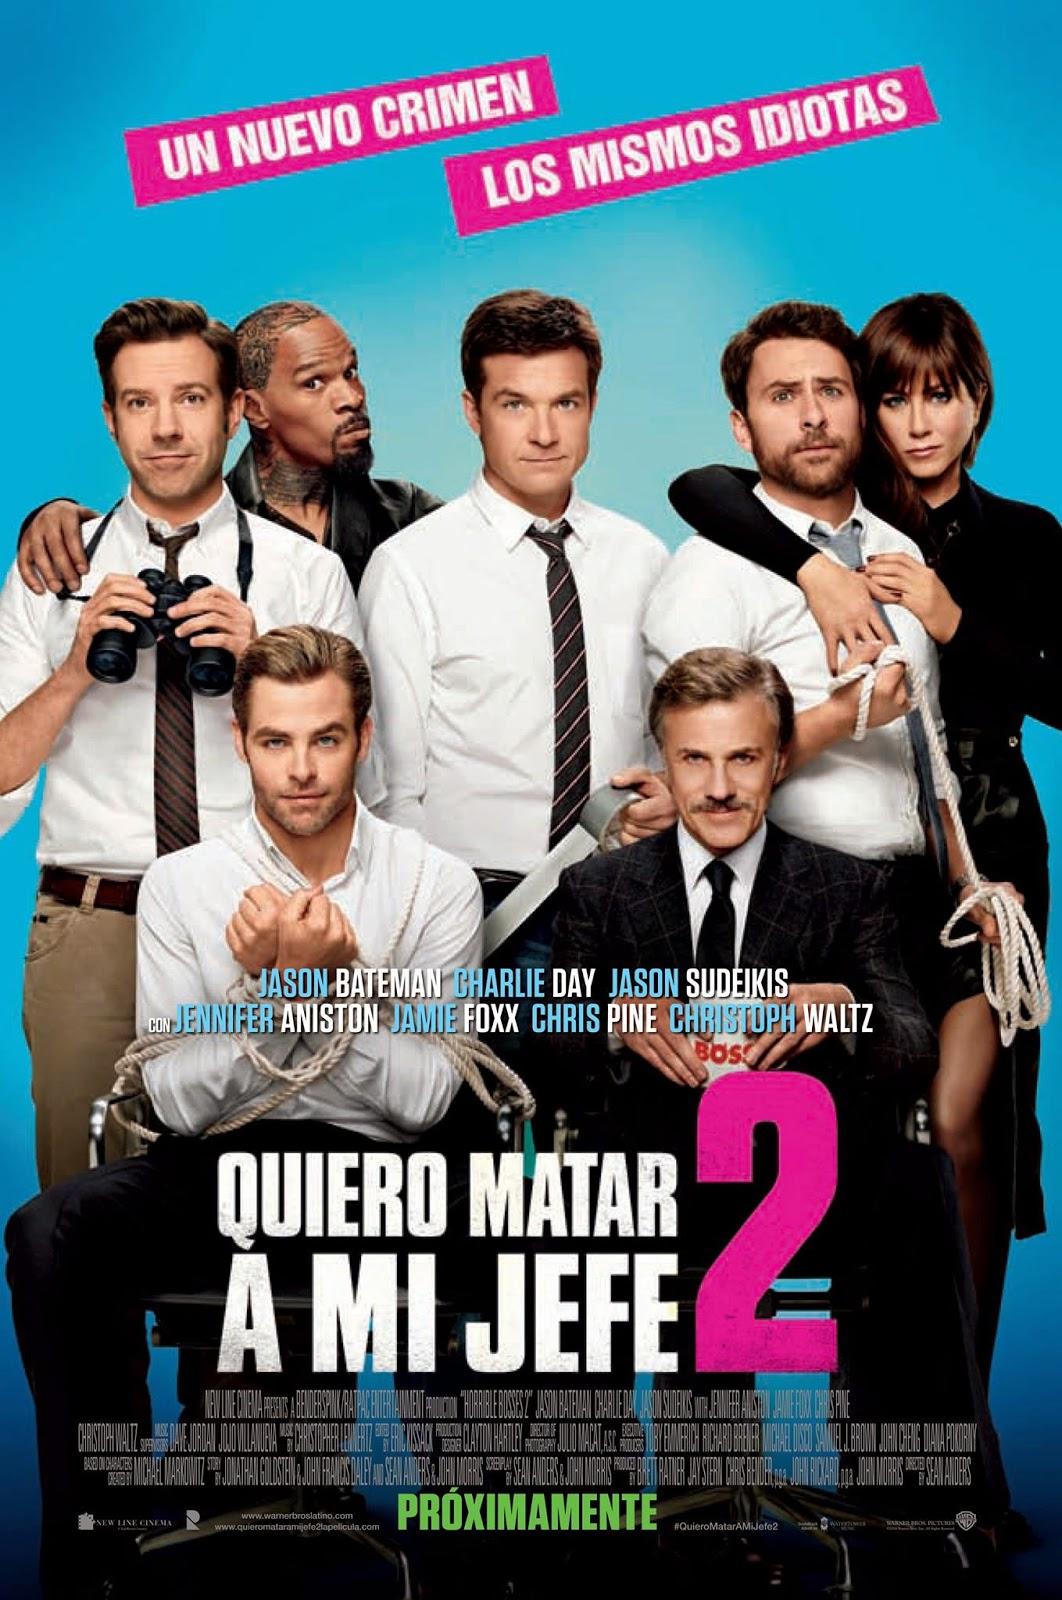 Quiero Matar A Mi Jefe 2 (2014) [Dvdrip] [Latino] [1 Link]